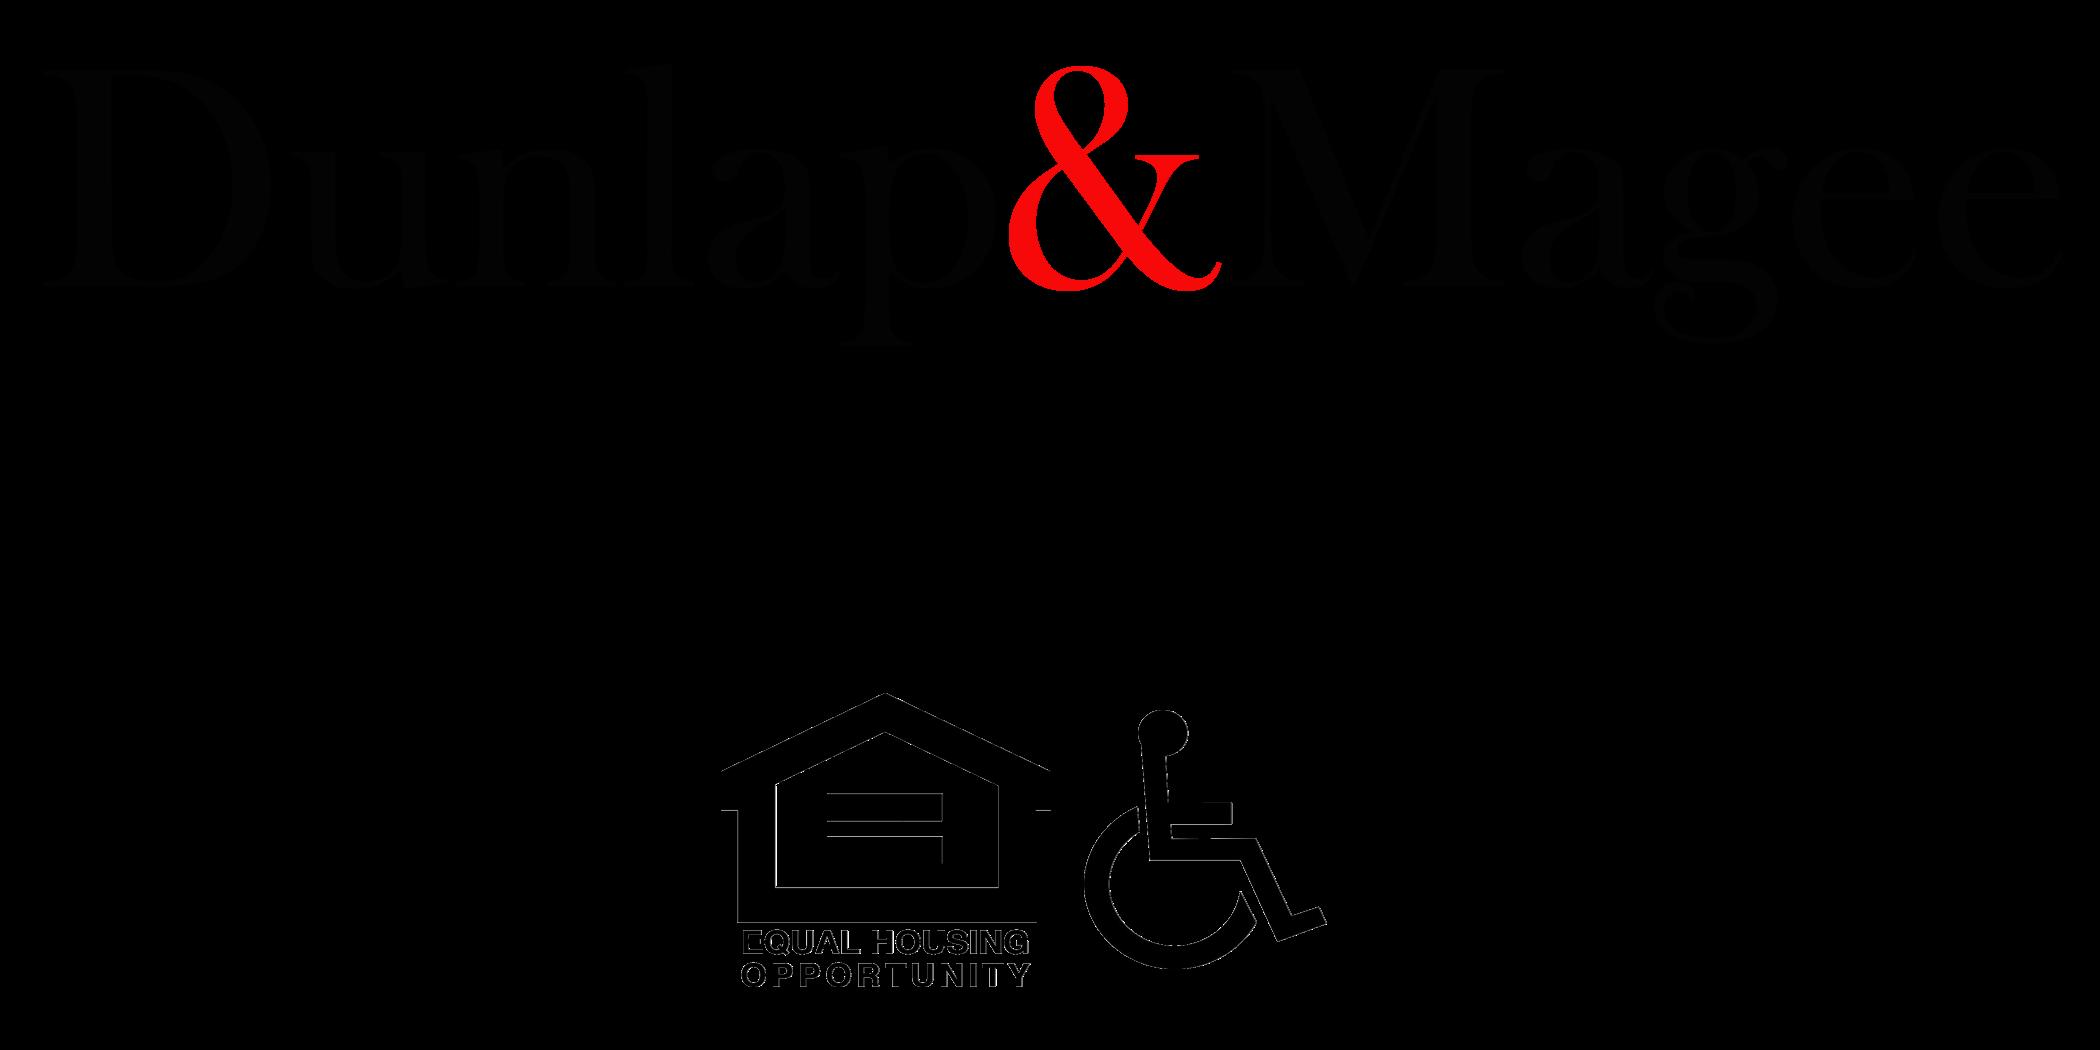 Dunlap & Magee Property Management